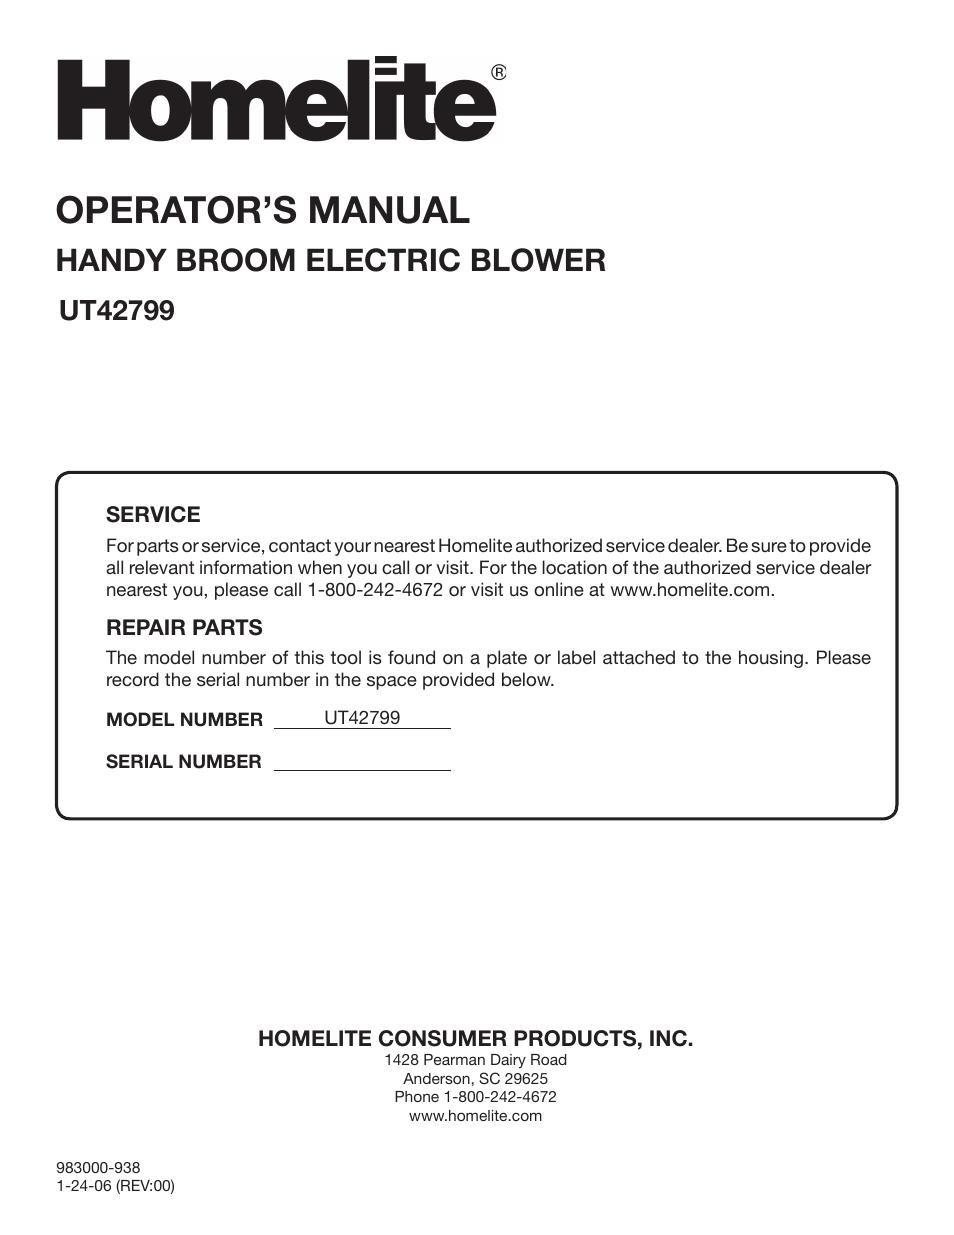 Operator's Manual, Handy Broom Electric Blower